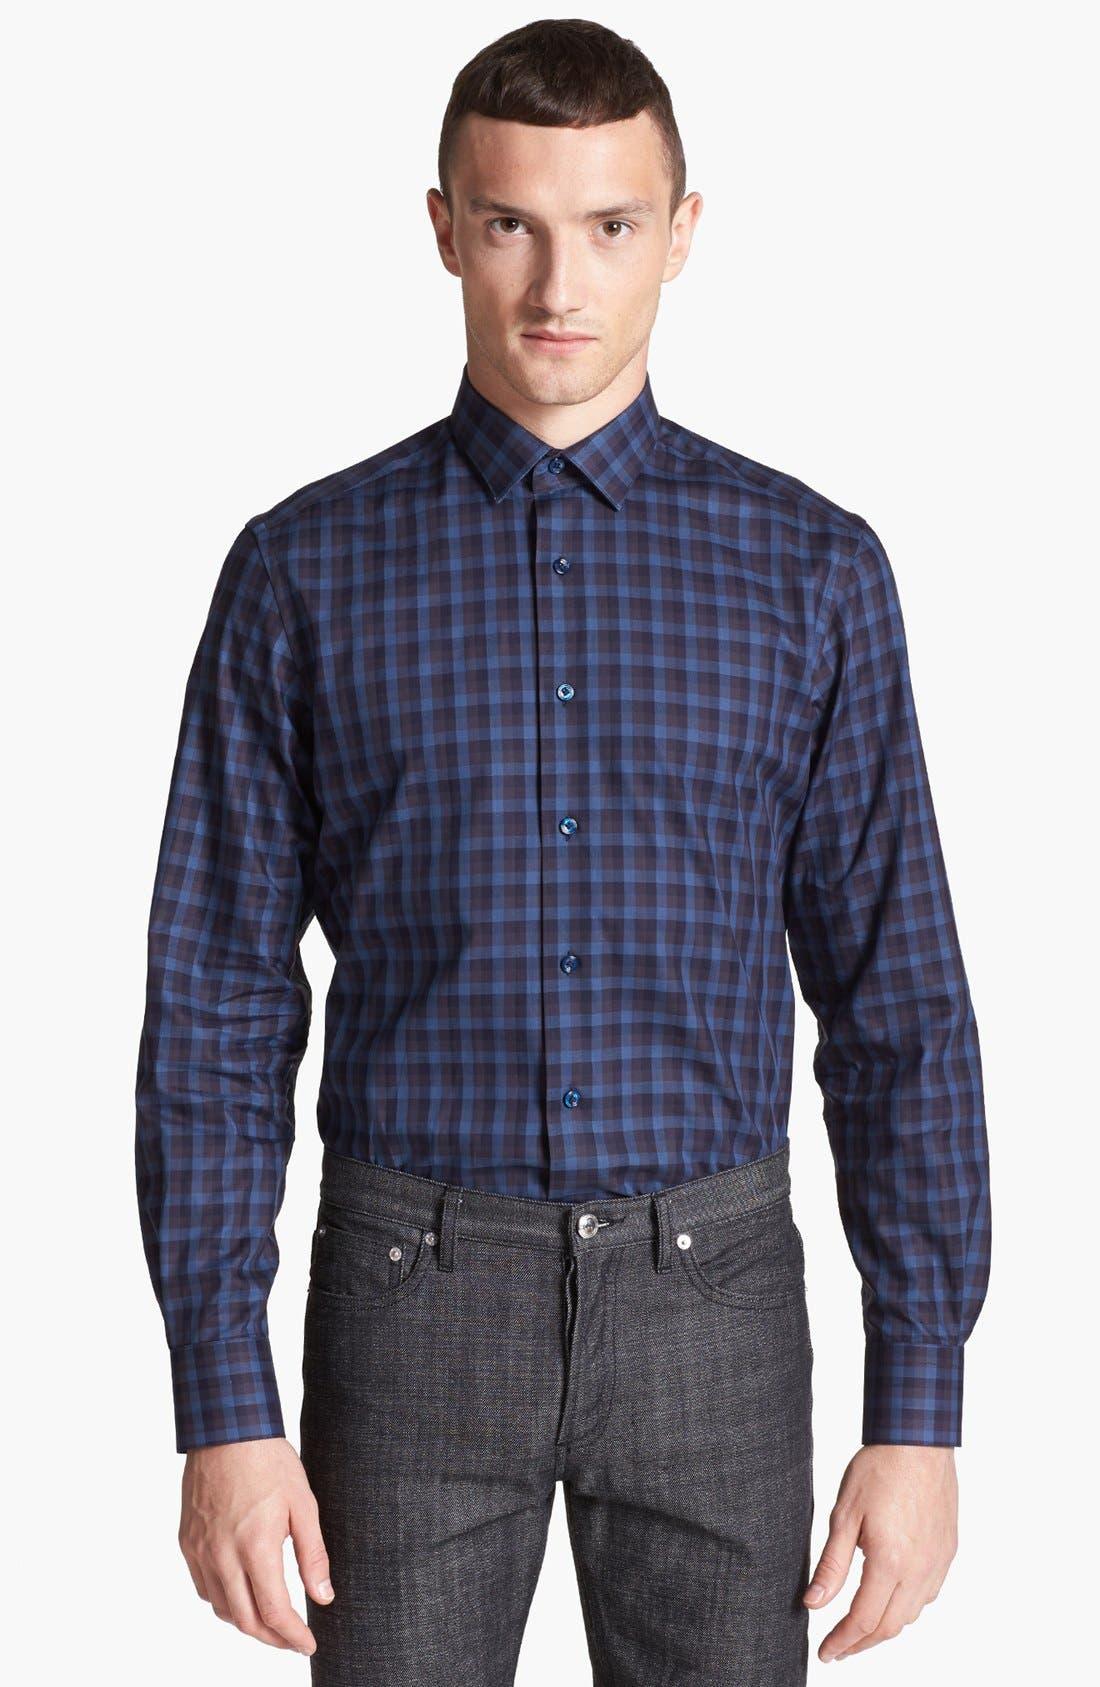 Alternate Image 1 Selected - Lanvin Check Dress Shirt